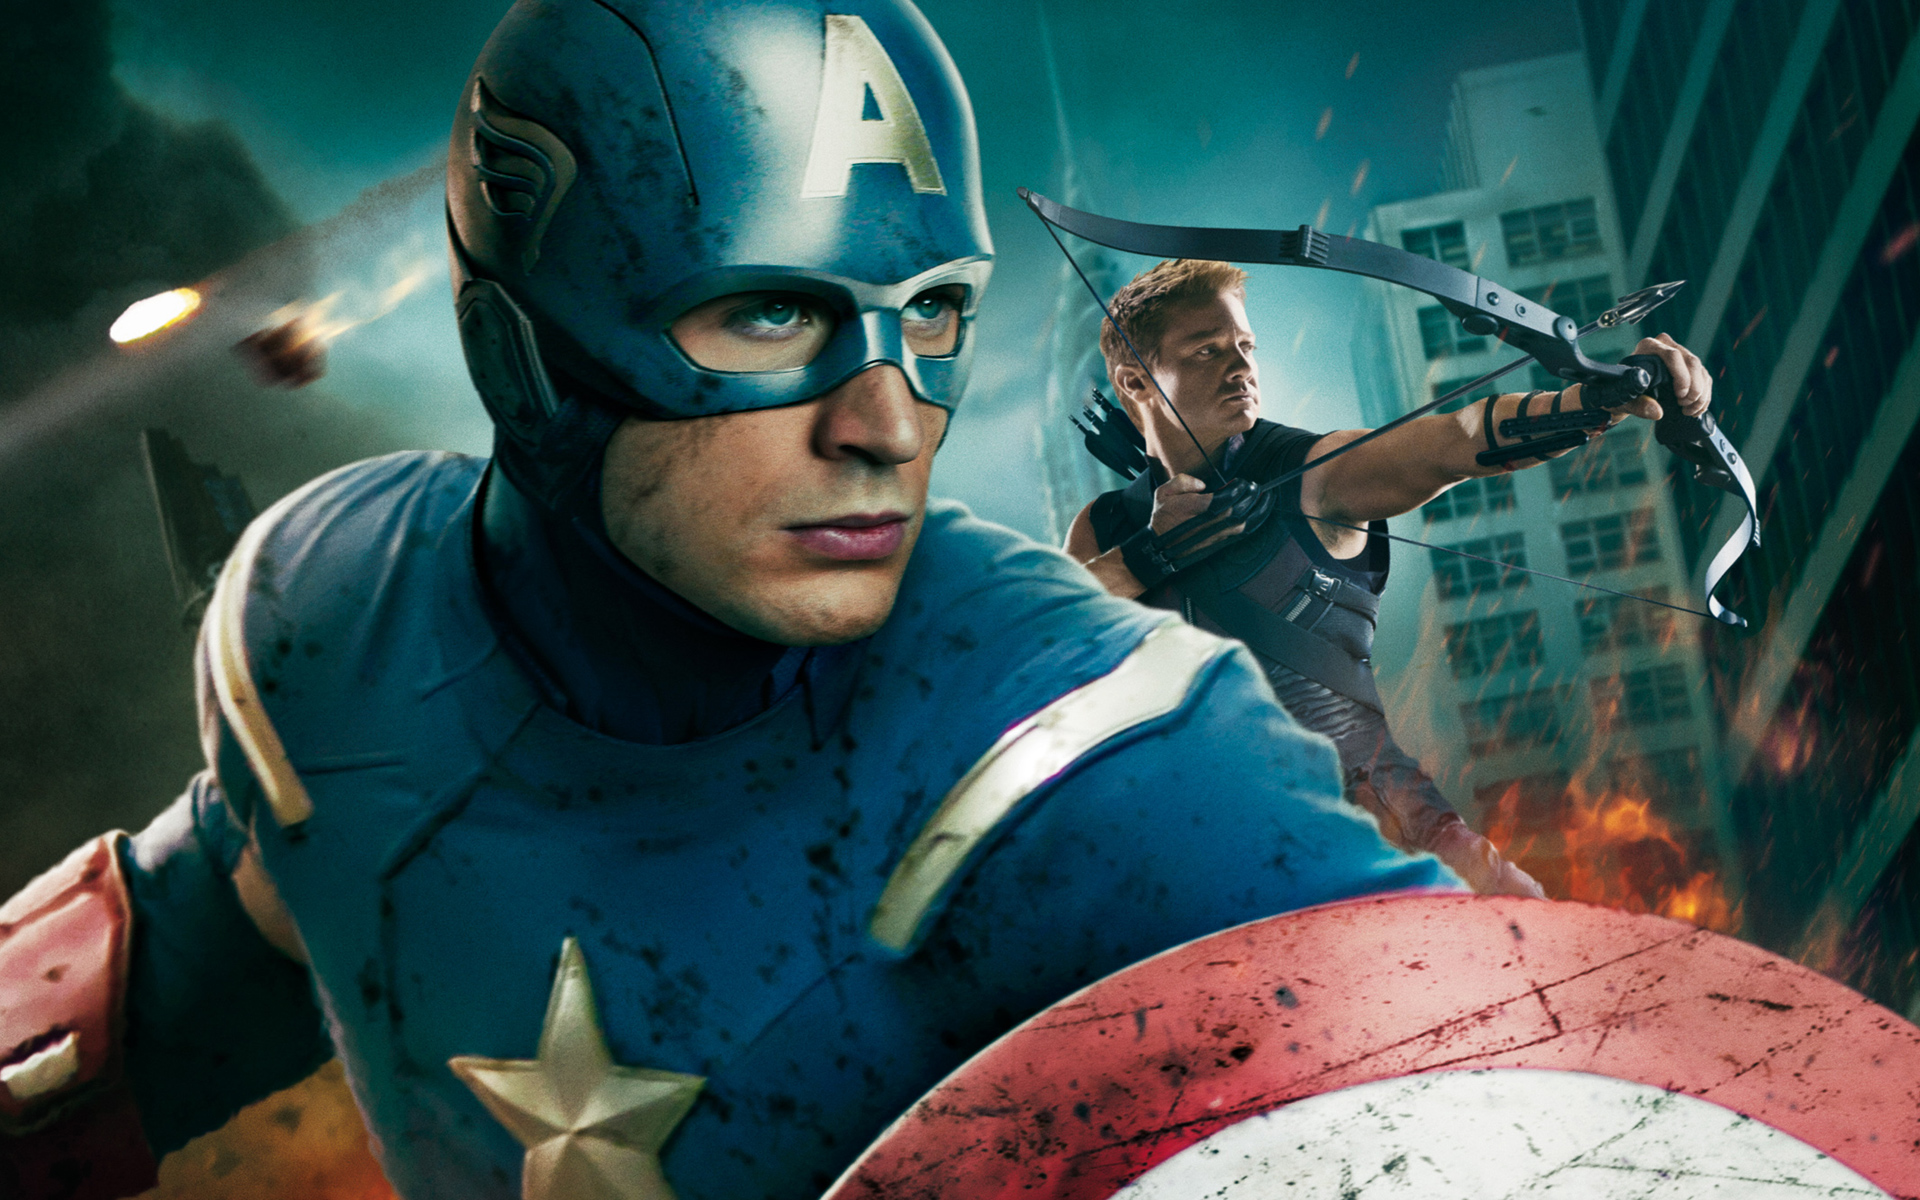 4168050-captain-america-in-avengers-movie